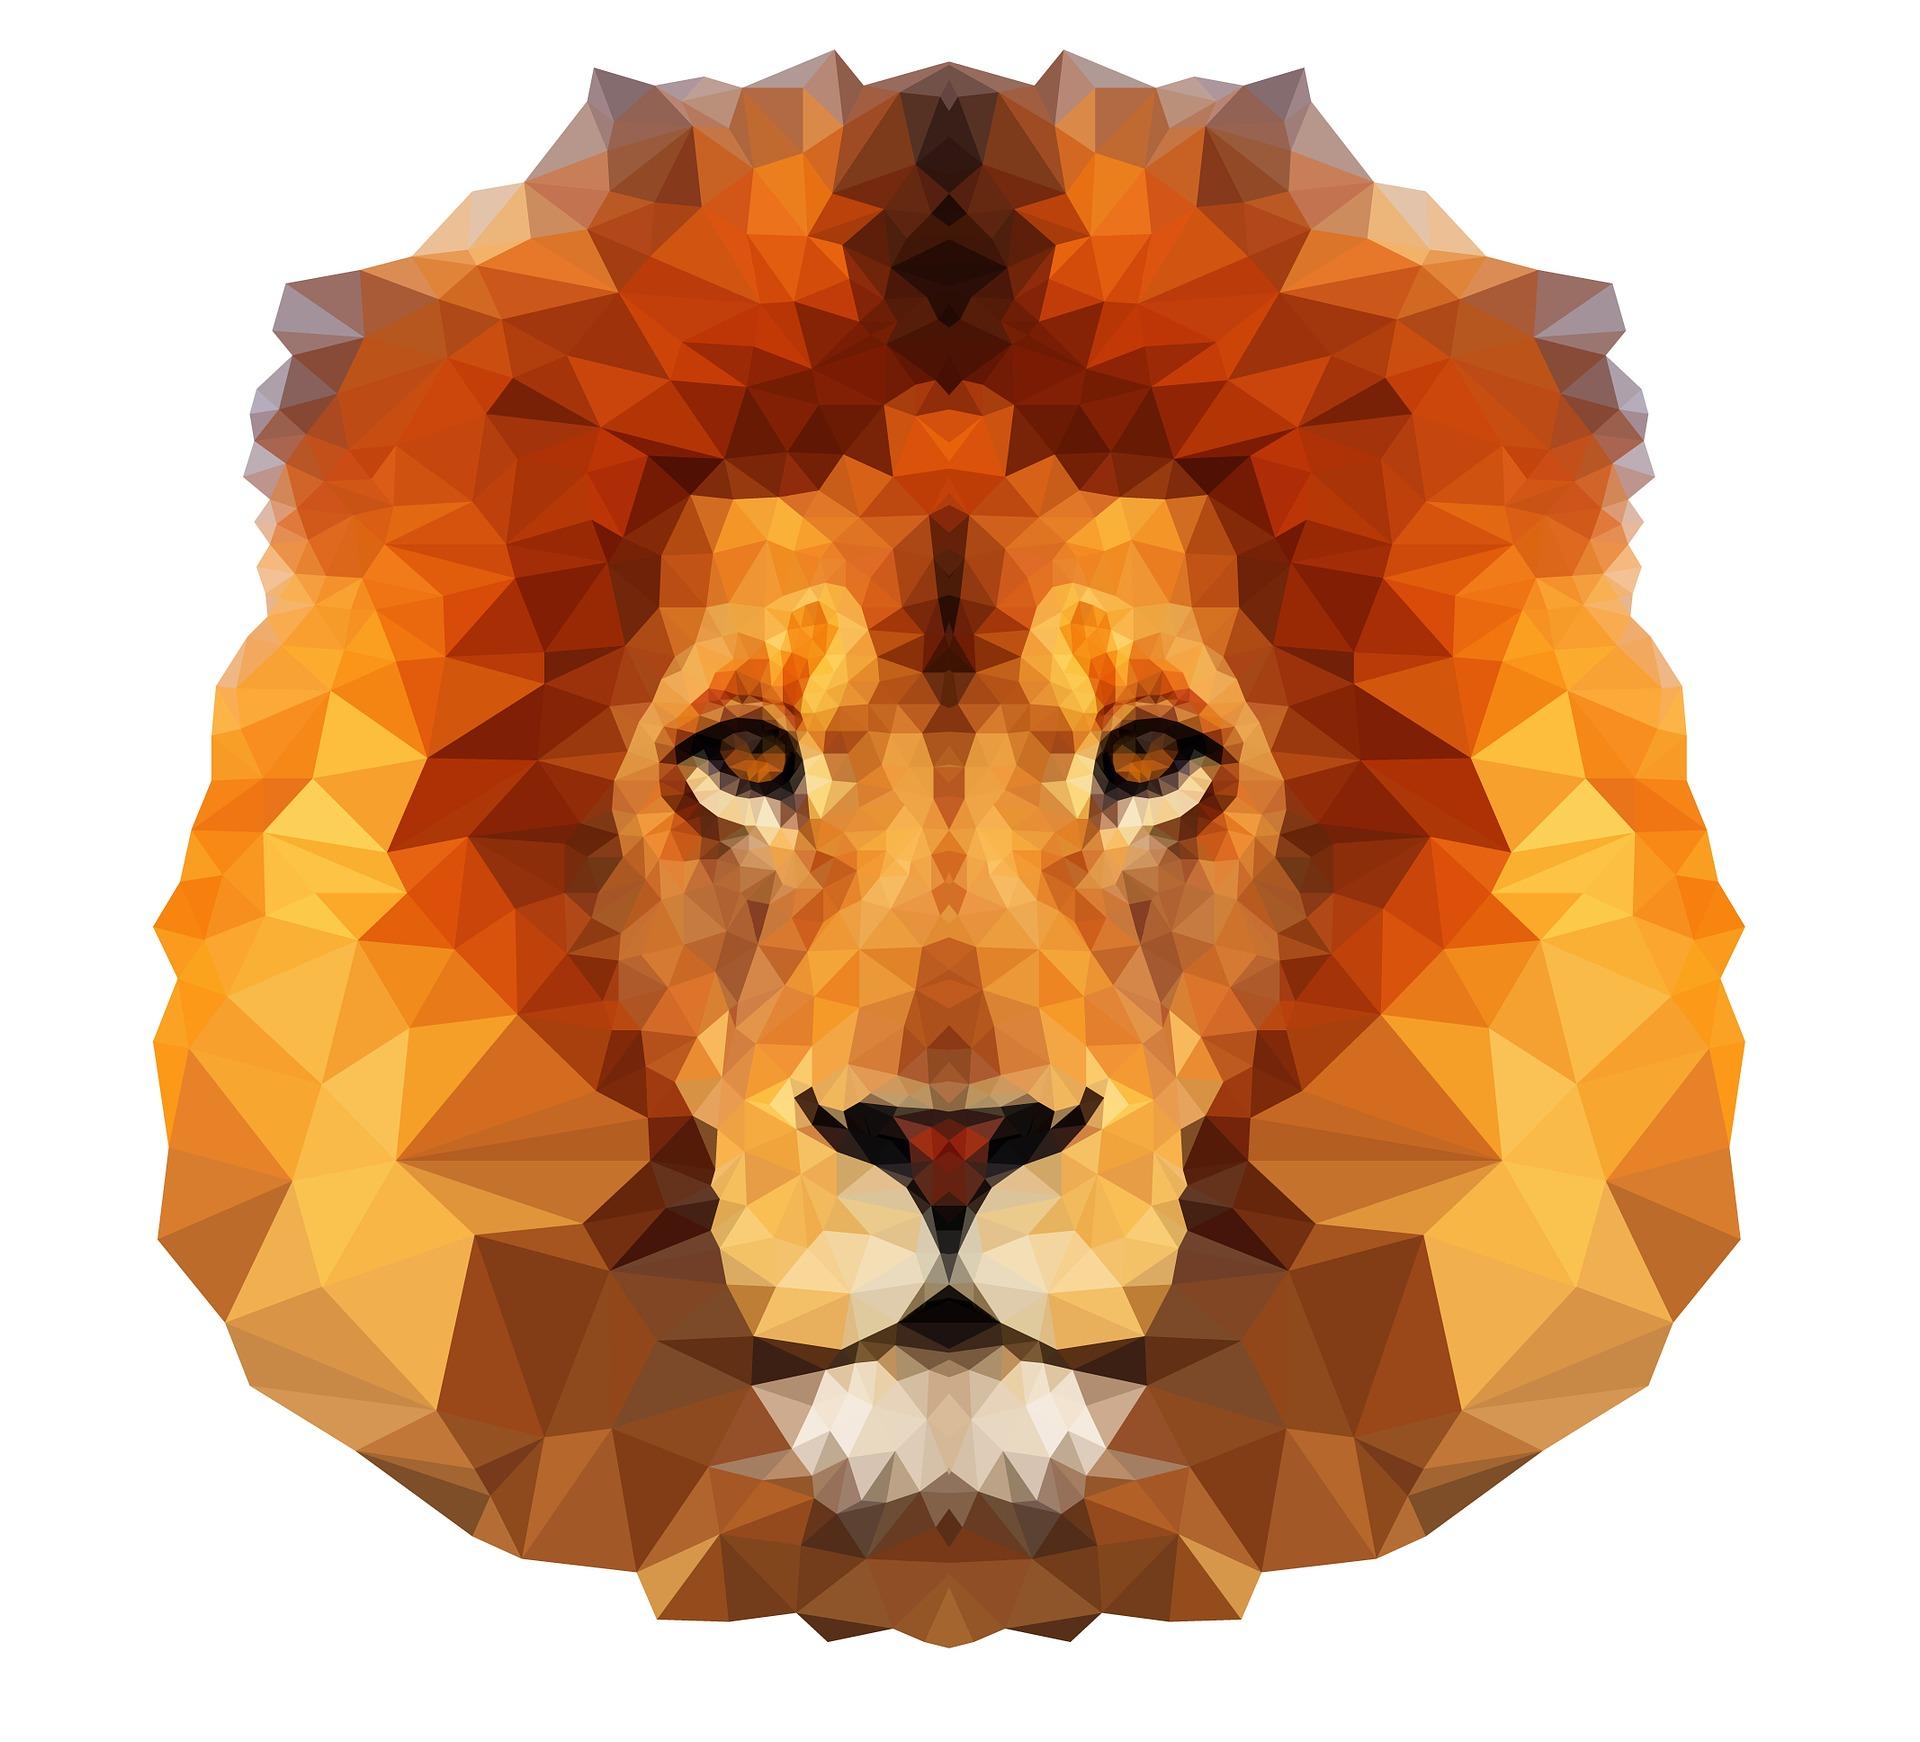 lion-1214652_1920.jpg